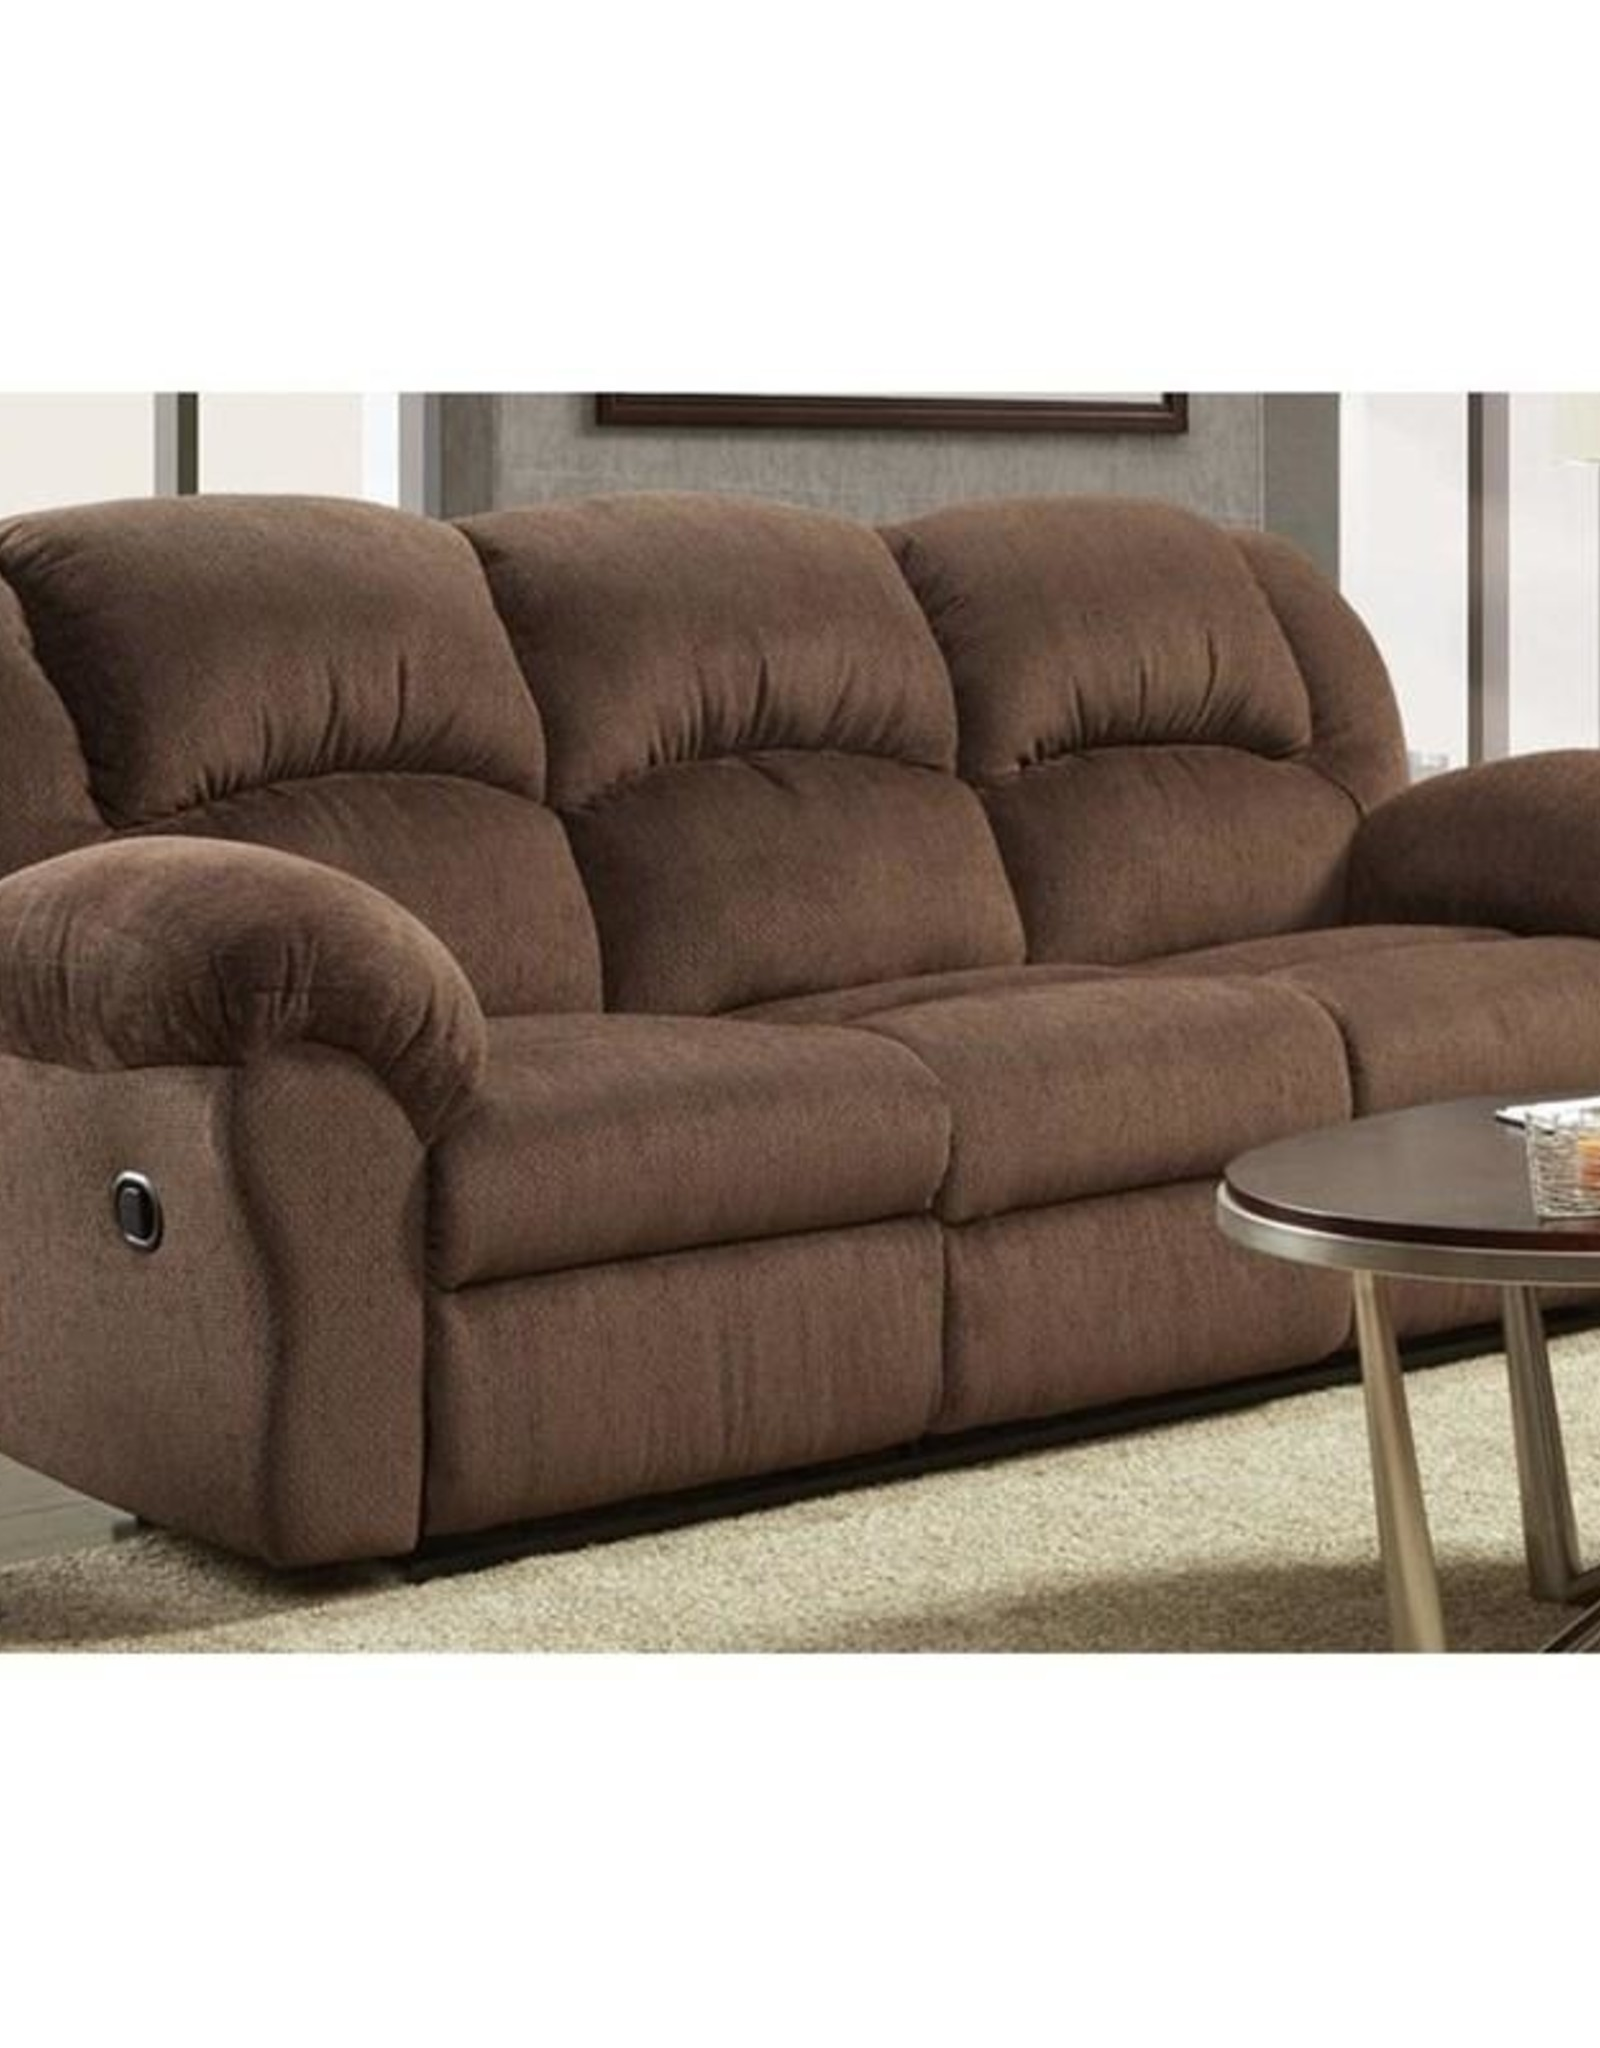 Affordable Furniture Aspen Chocolate Sofa